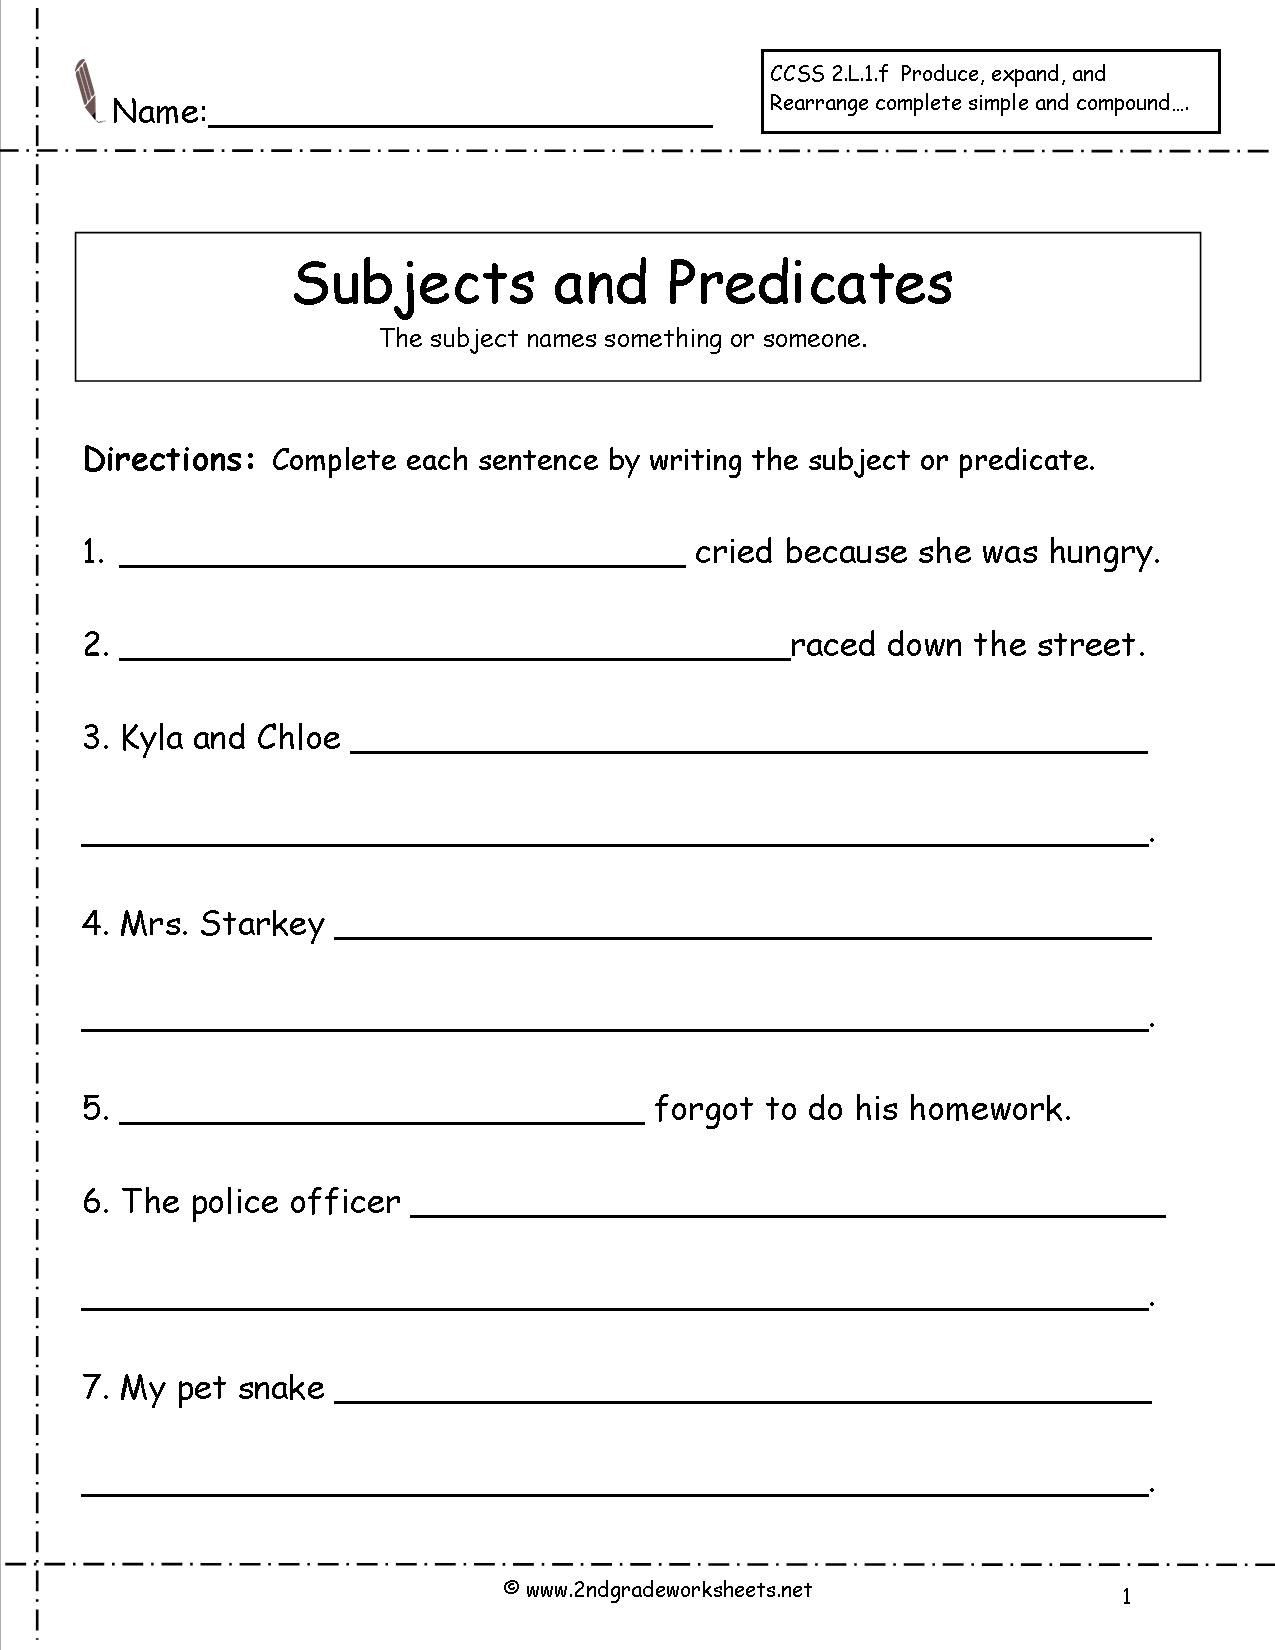 Subject and Predicate Worksheet Subject and Predicate Worksheet